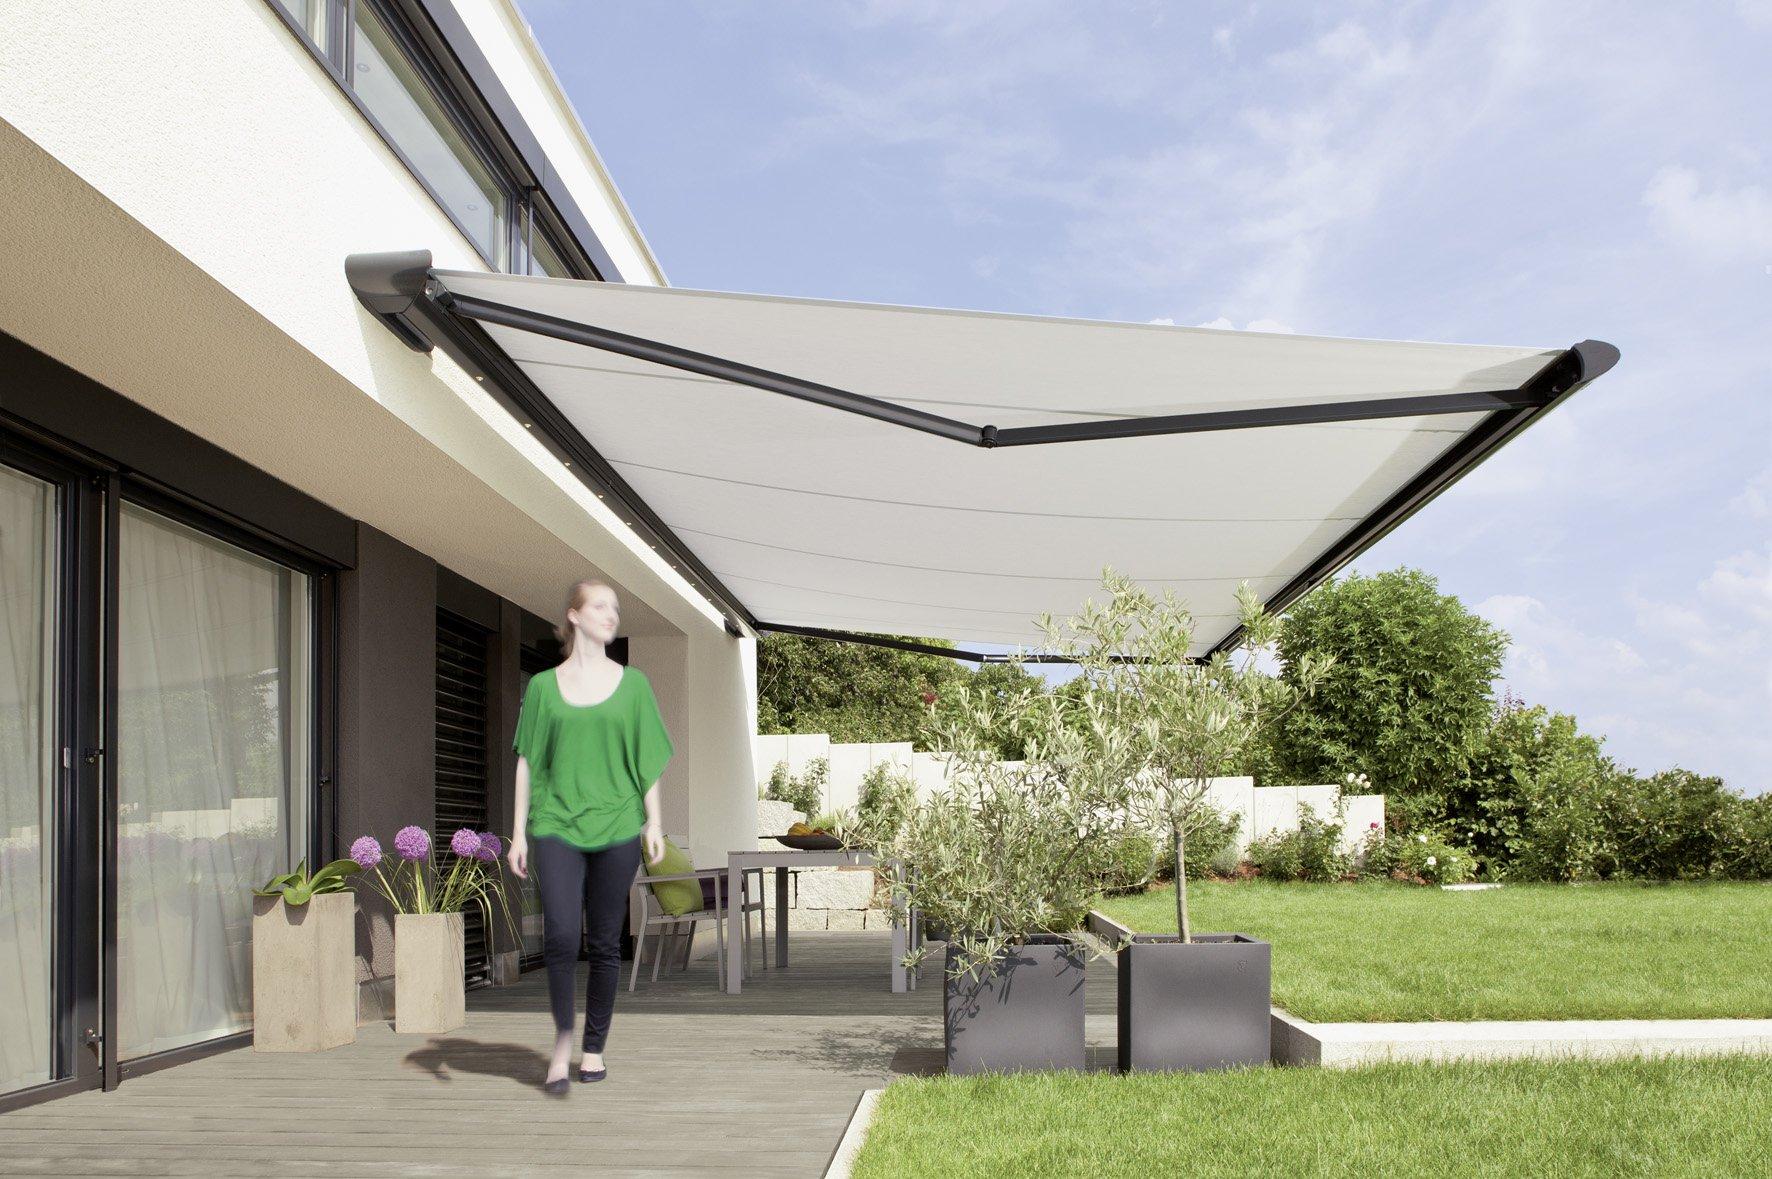 sonnenschutz riel metallbau. Black Bedroom Furniture Sets. Home Design Ideas